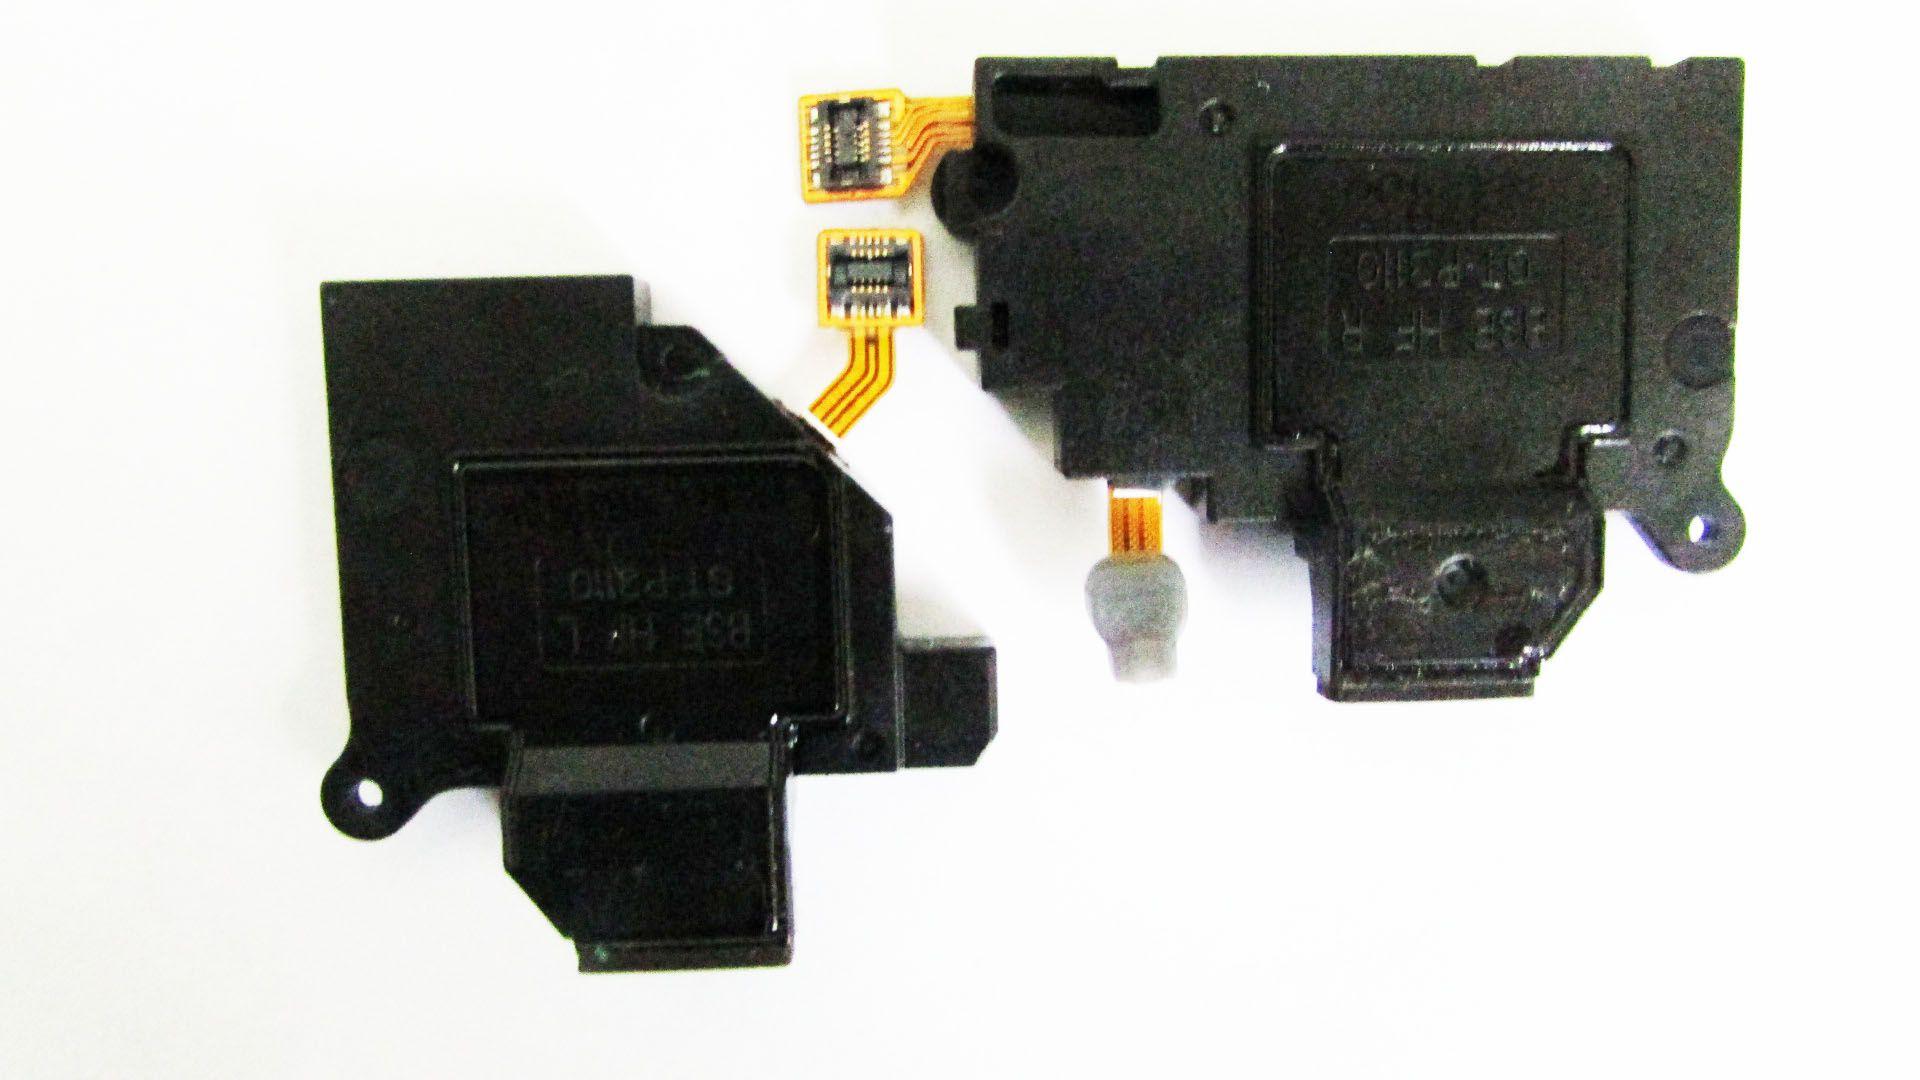 Par De Alto Falantes Tablet Samsung Galaxy Gt-P3110 P3100 (semi novo)